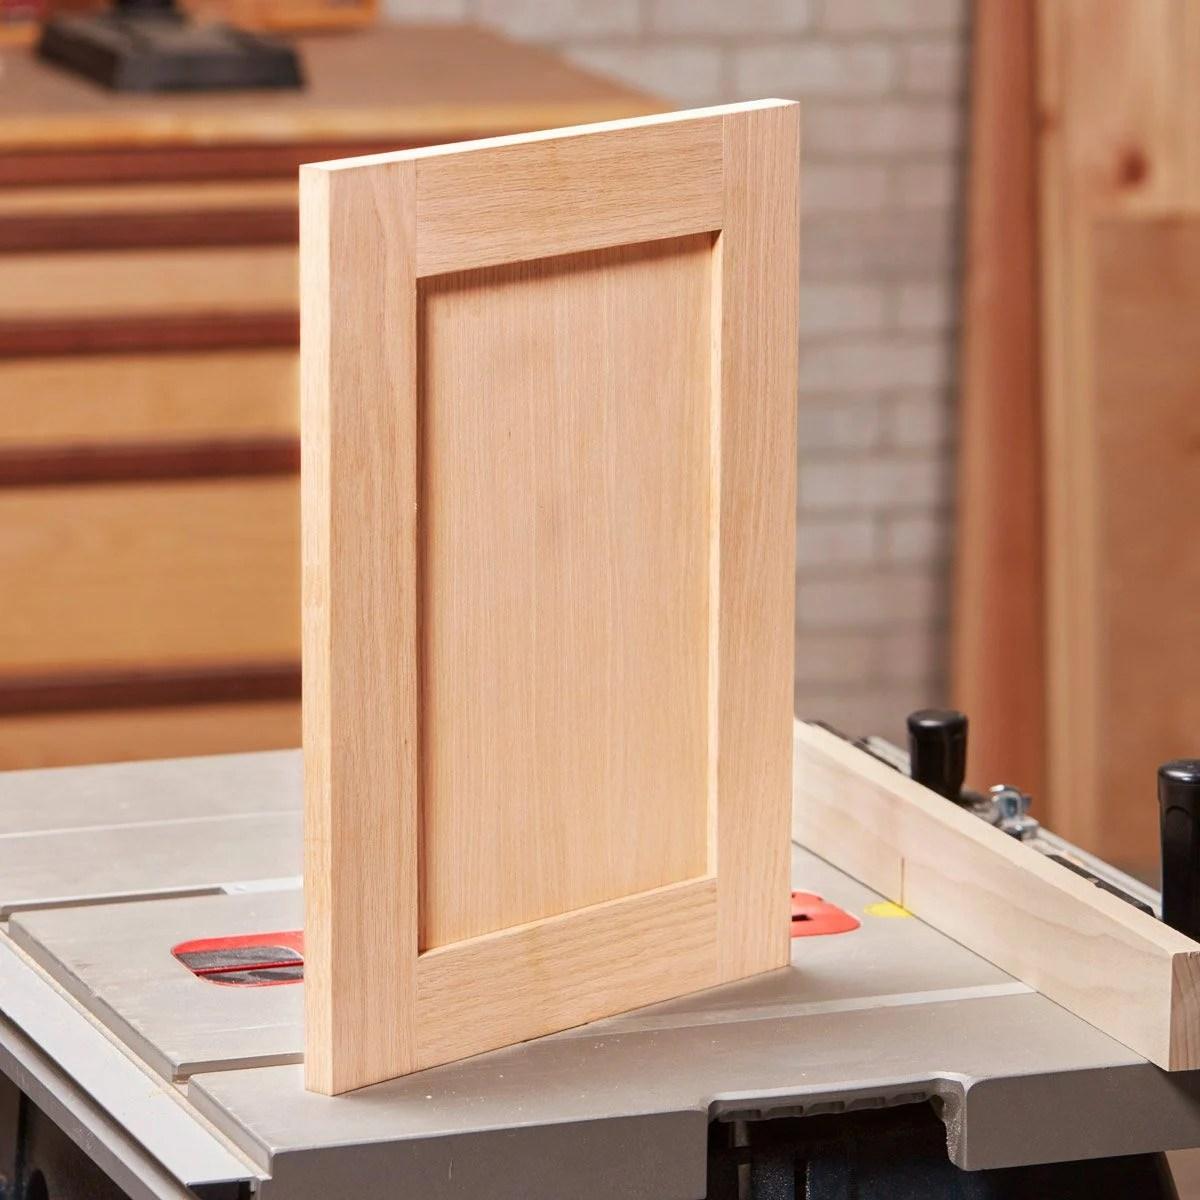 Diy Cabinet Doors How To Build And Install Cabinet Doors